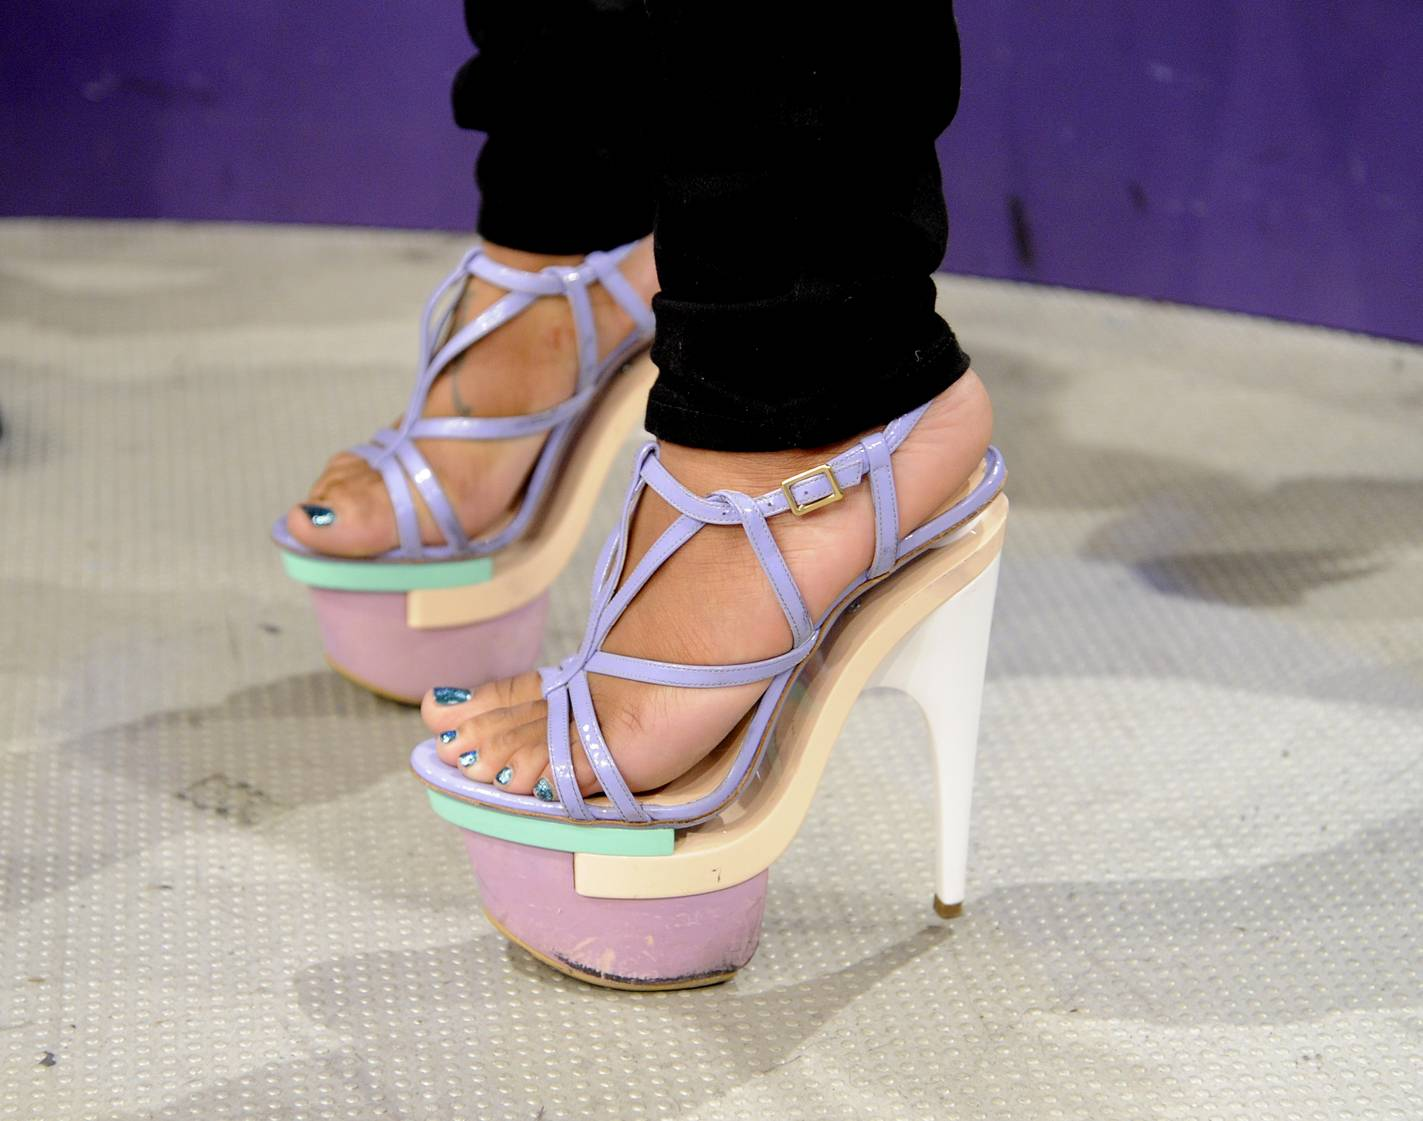 Nice Shoes - Dawn Richard at 106 & Park, January 05, 2012. (Photo: John Ricard/BET)